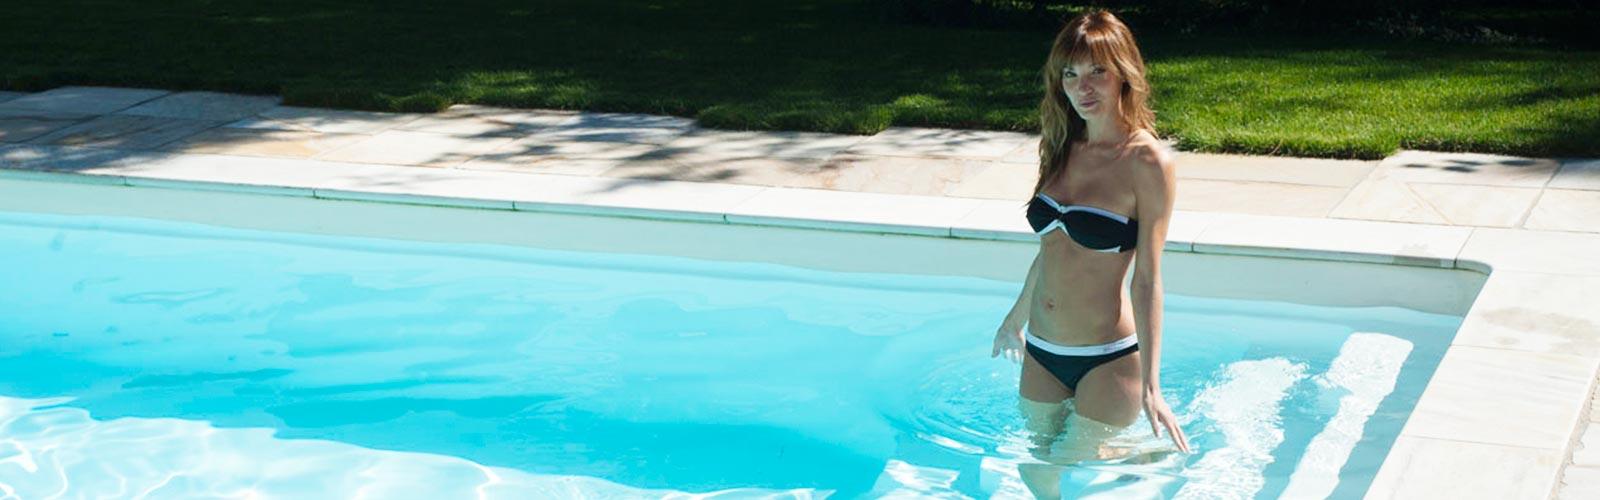 S&K GmbH Jacuzzi Whirlpool - Eine Frau im Pool